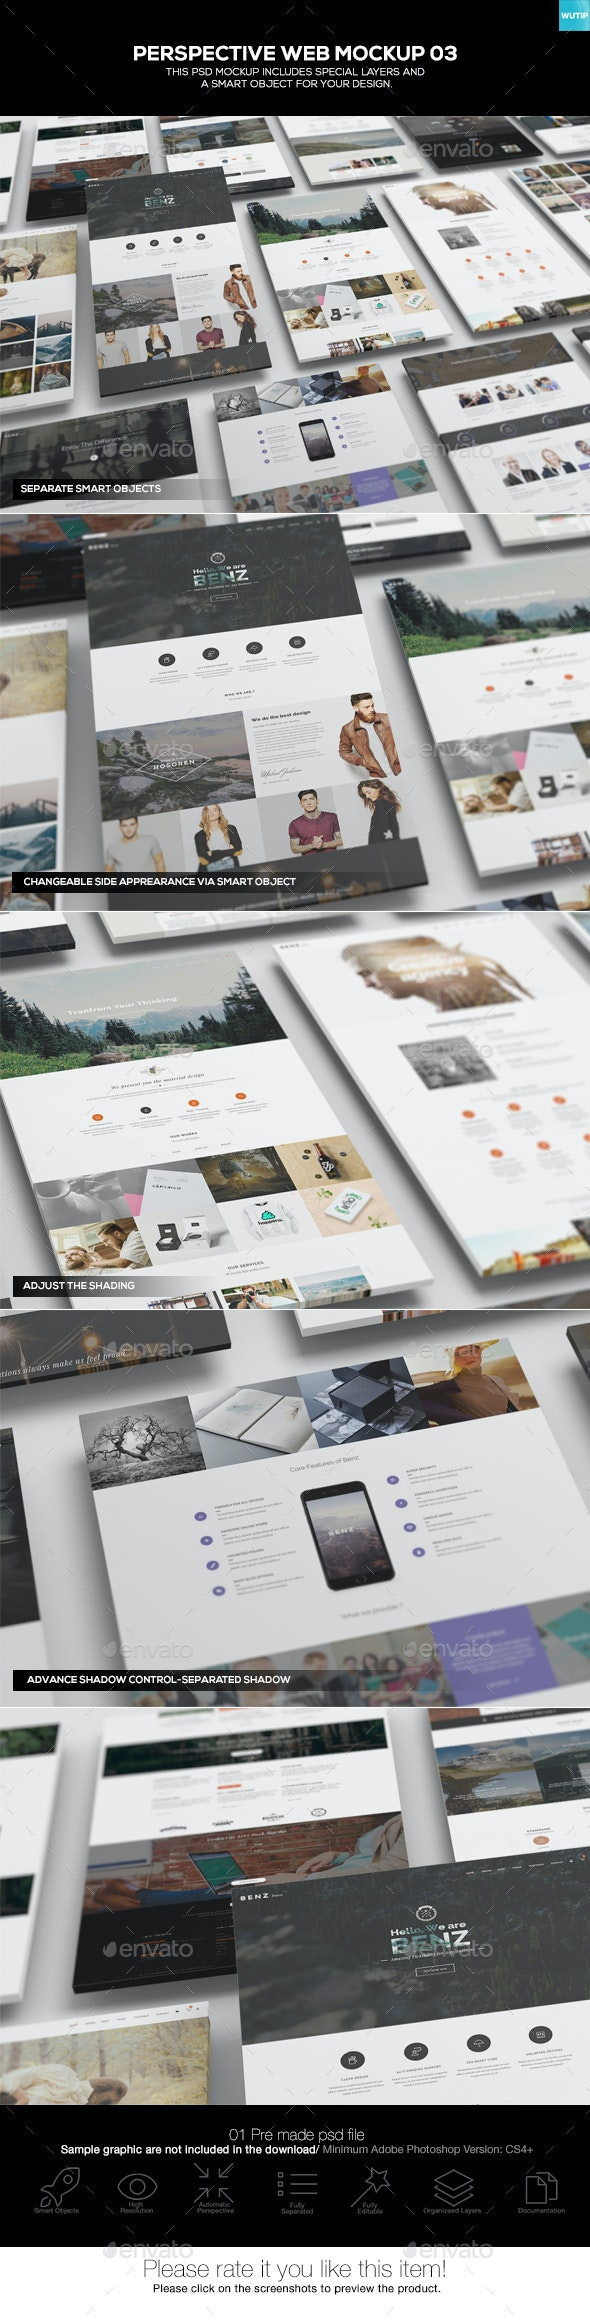 Perspective Web Mockup 03 - Website Displays